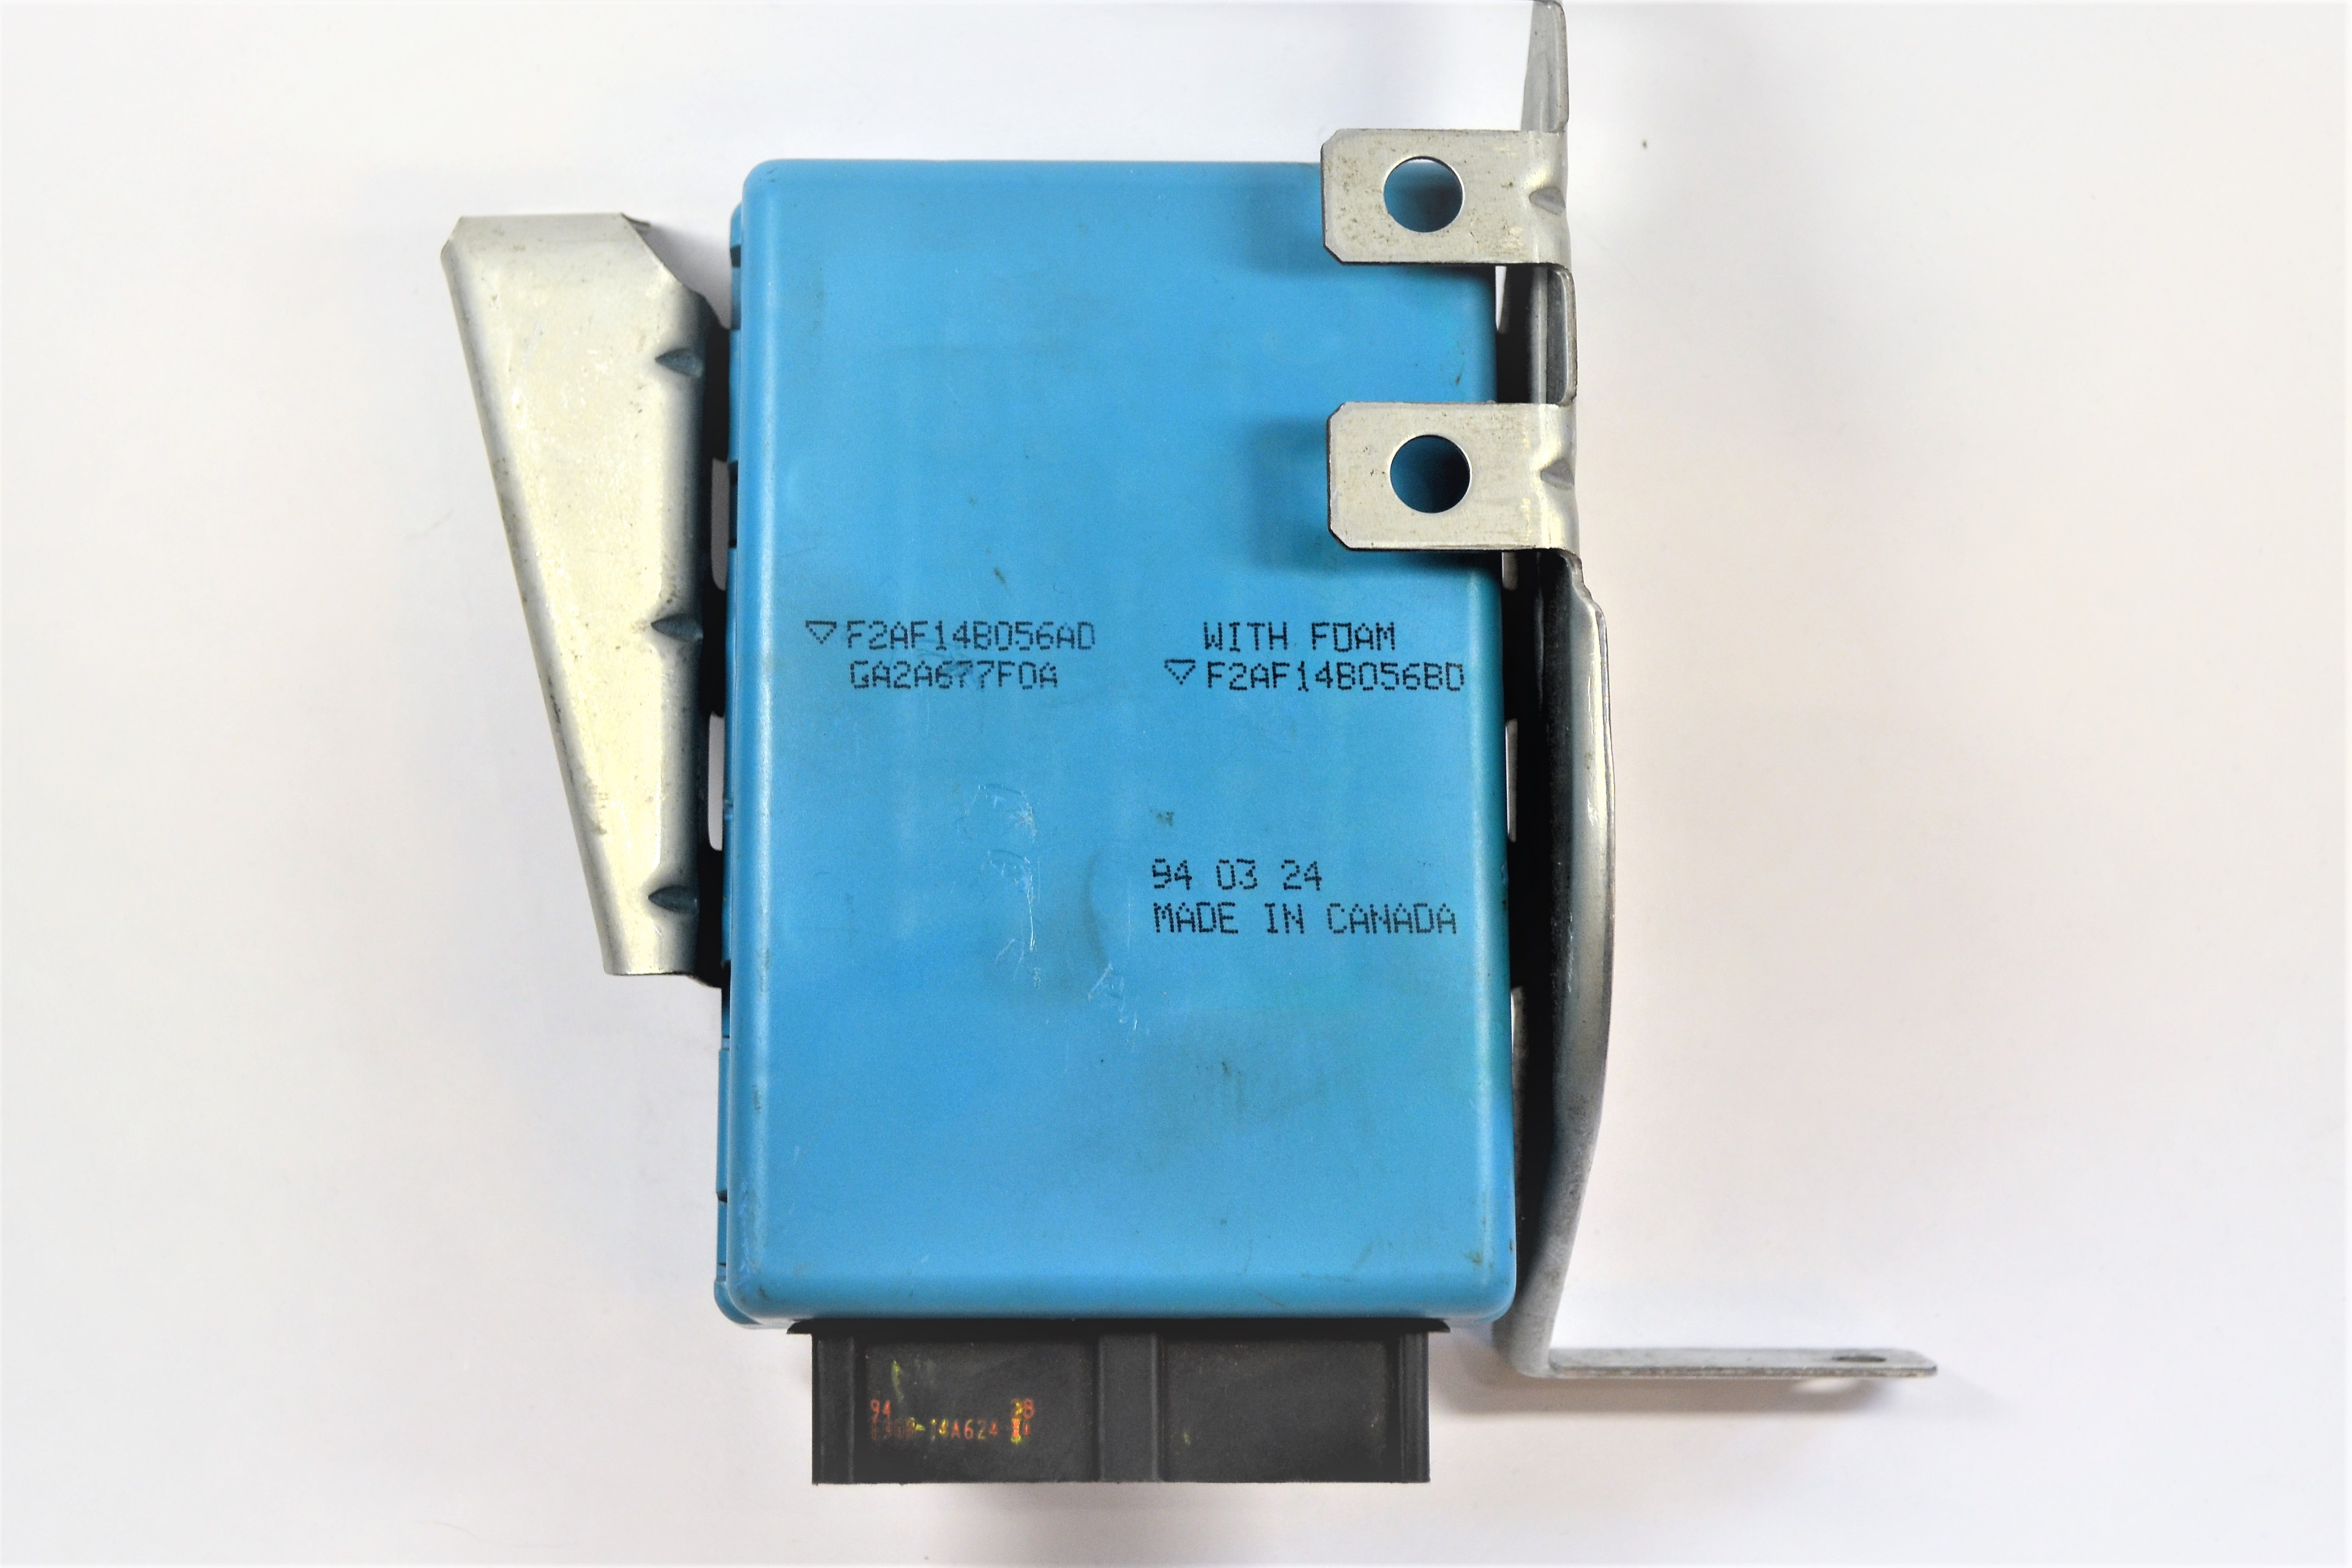 mazda mx 5 airbag steuerger t f2af 14b056 ad reparatur pr fung airbag 24 airbag. Black Bedroom Furniture Sets. Home Design Ideas